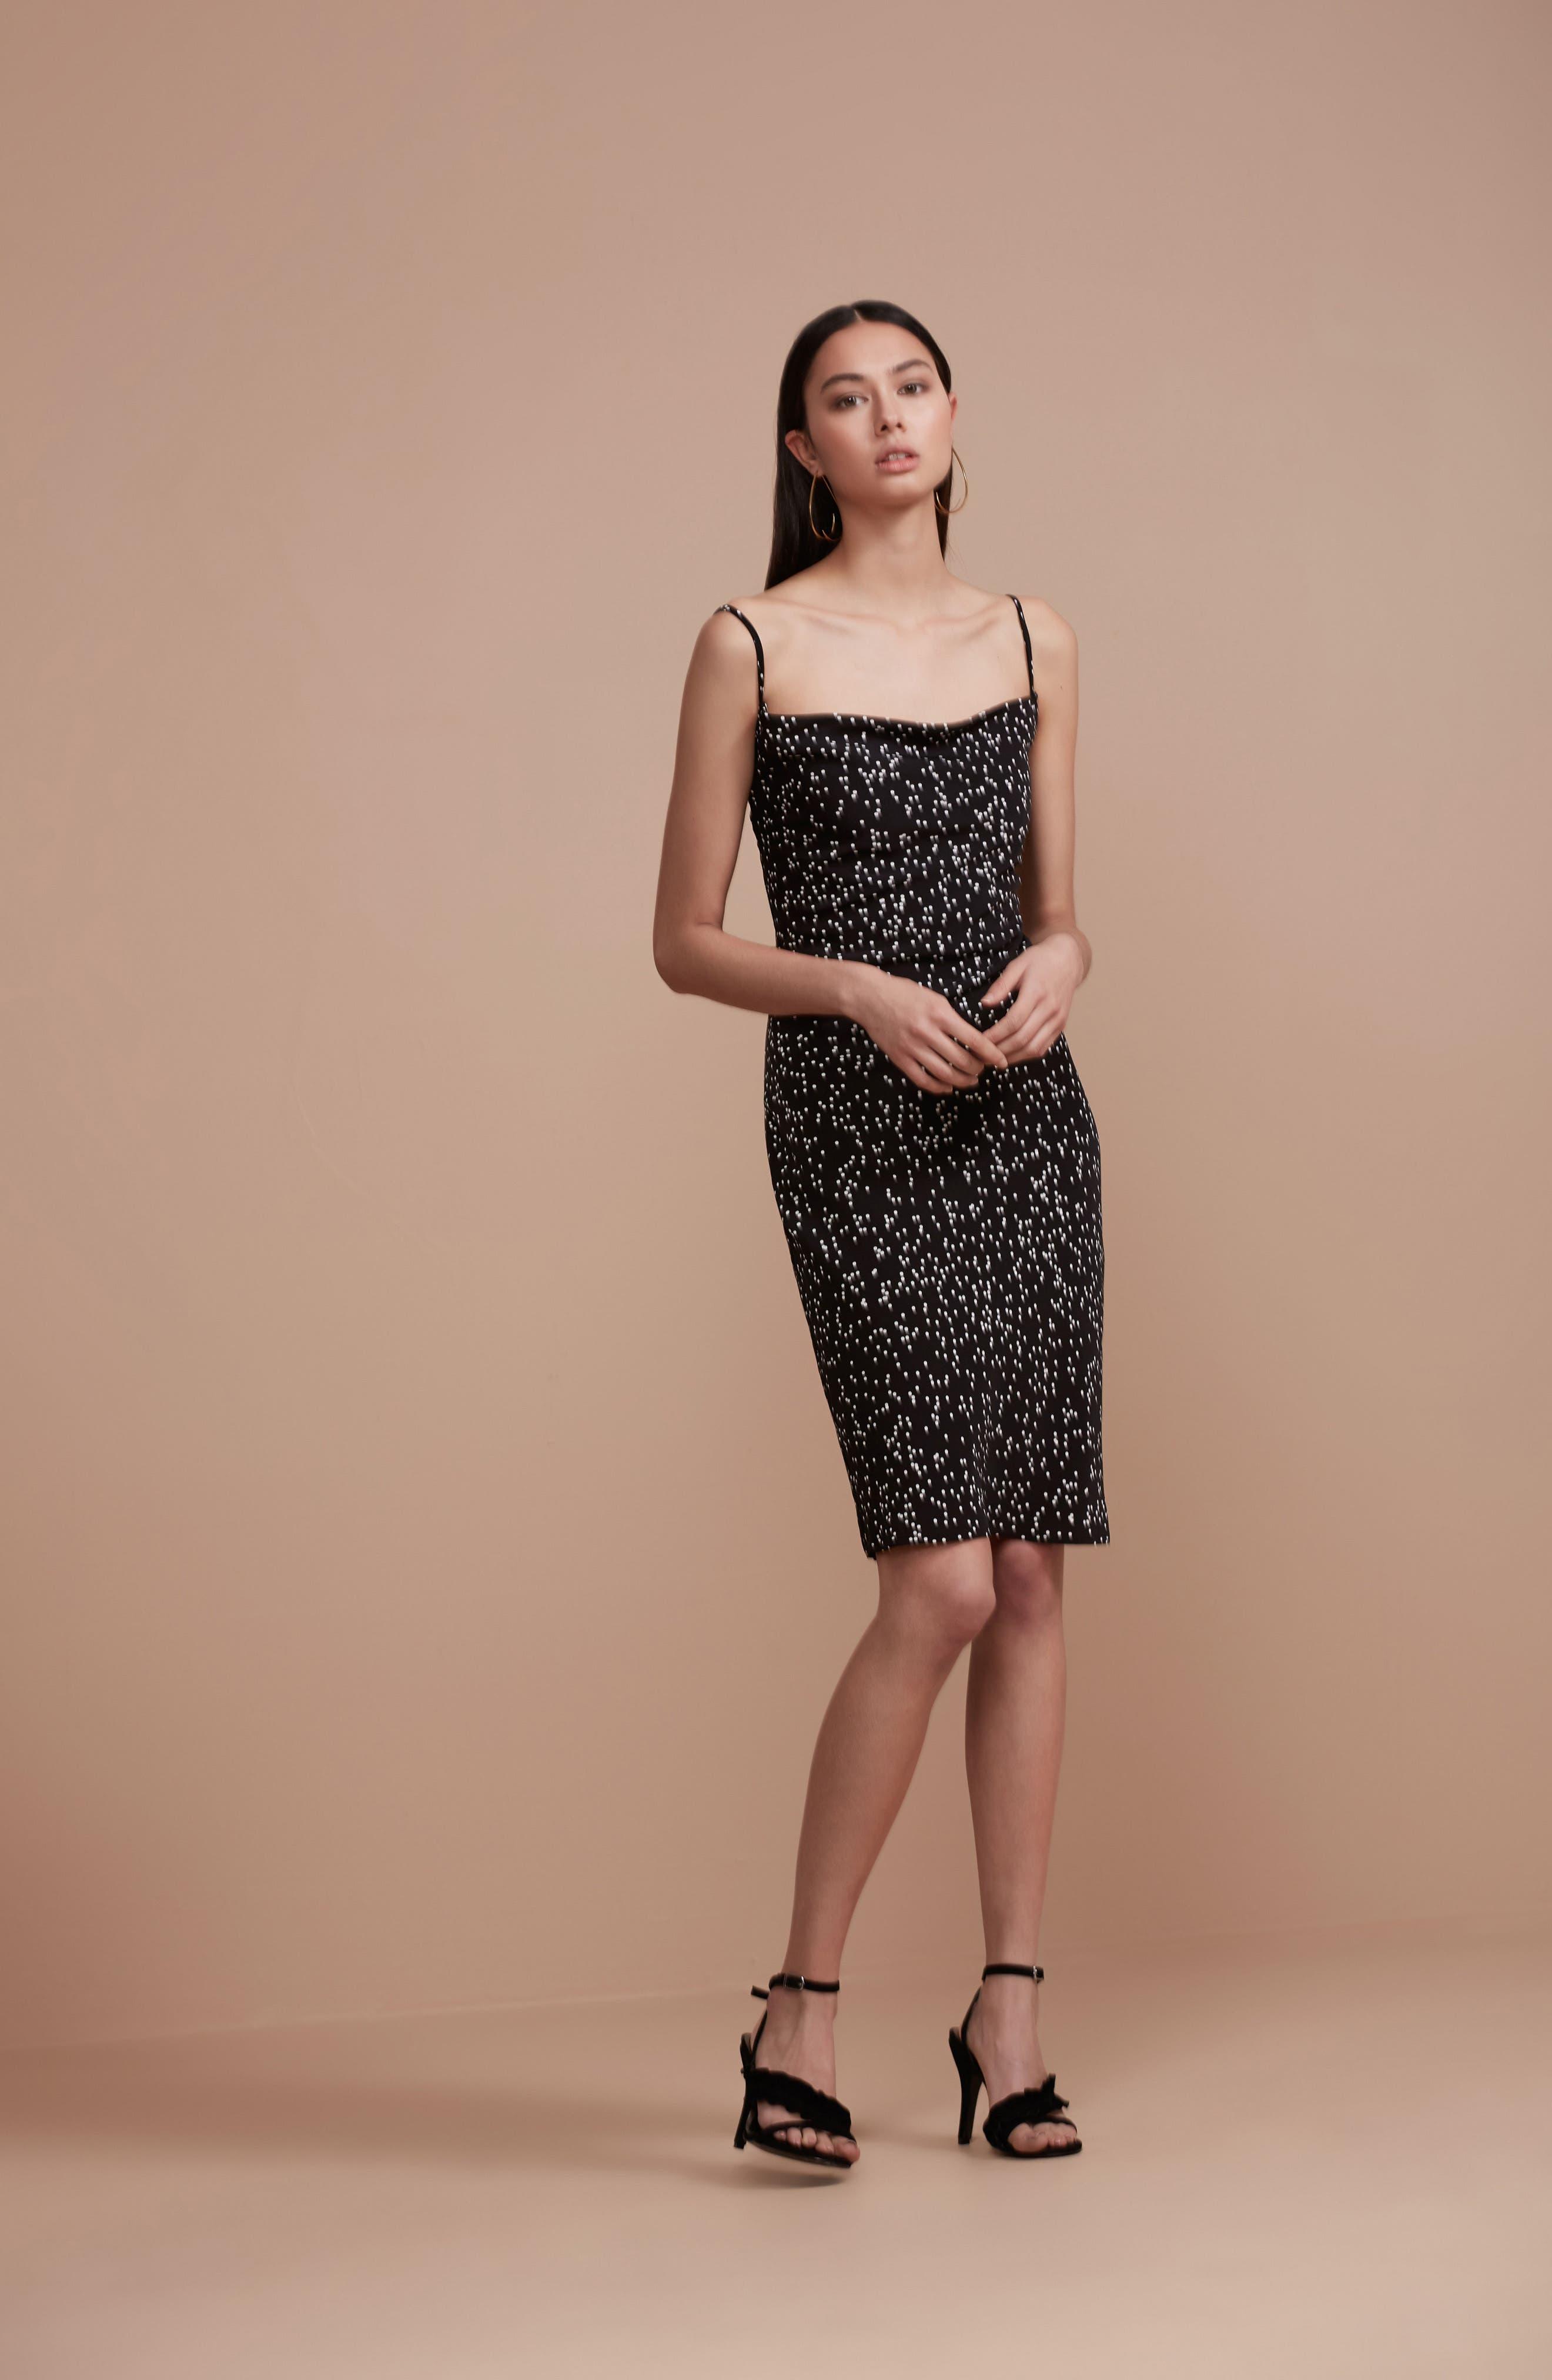 Embrace Me Tie Back Sheath Dress,                             Alternate thumbnail 7, color,                             Black W White Spot